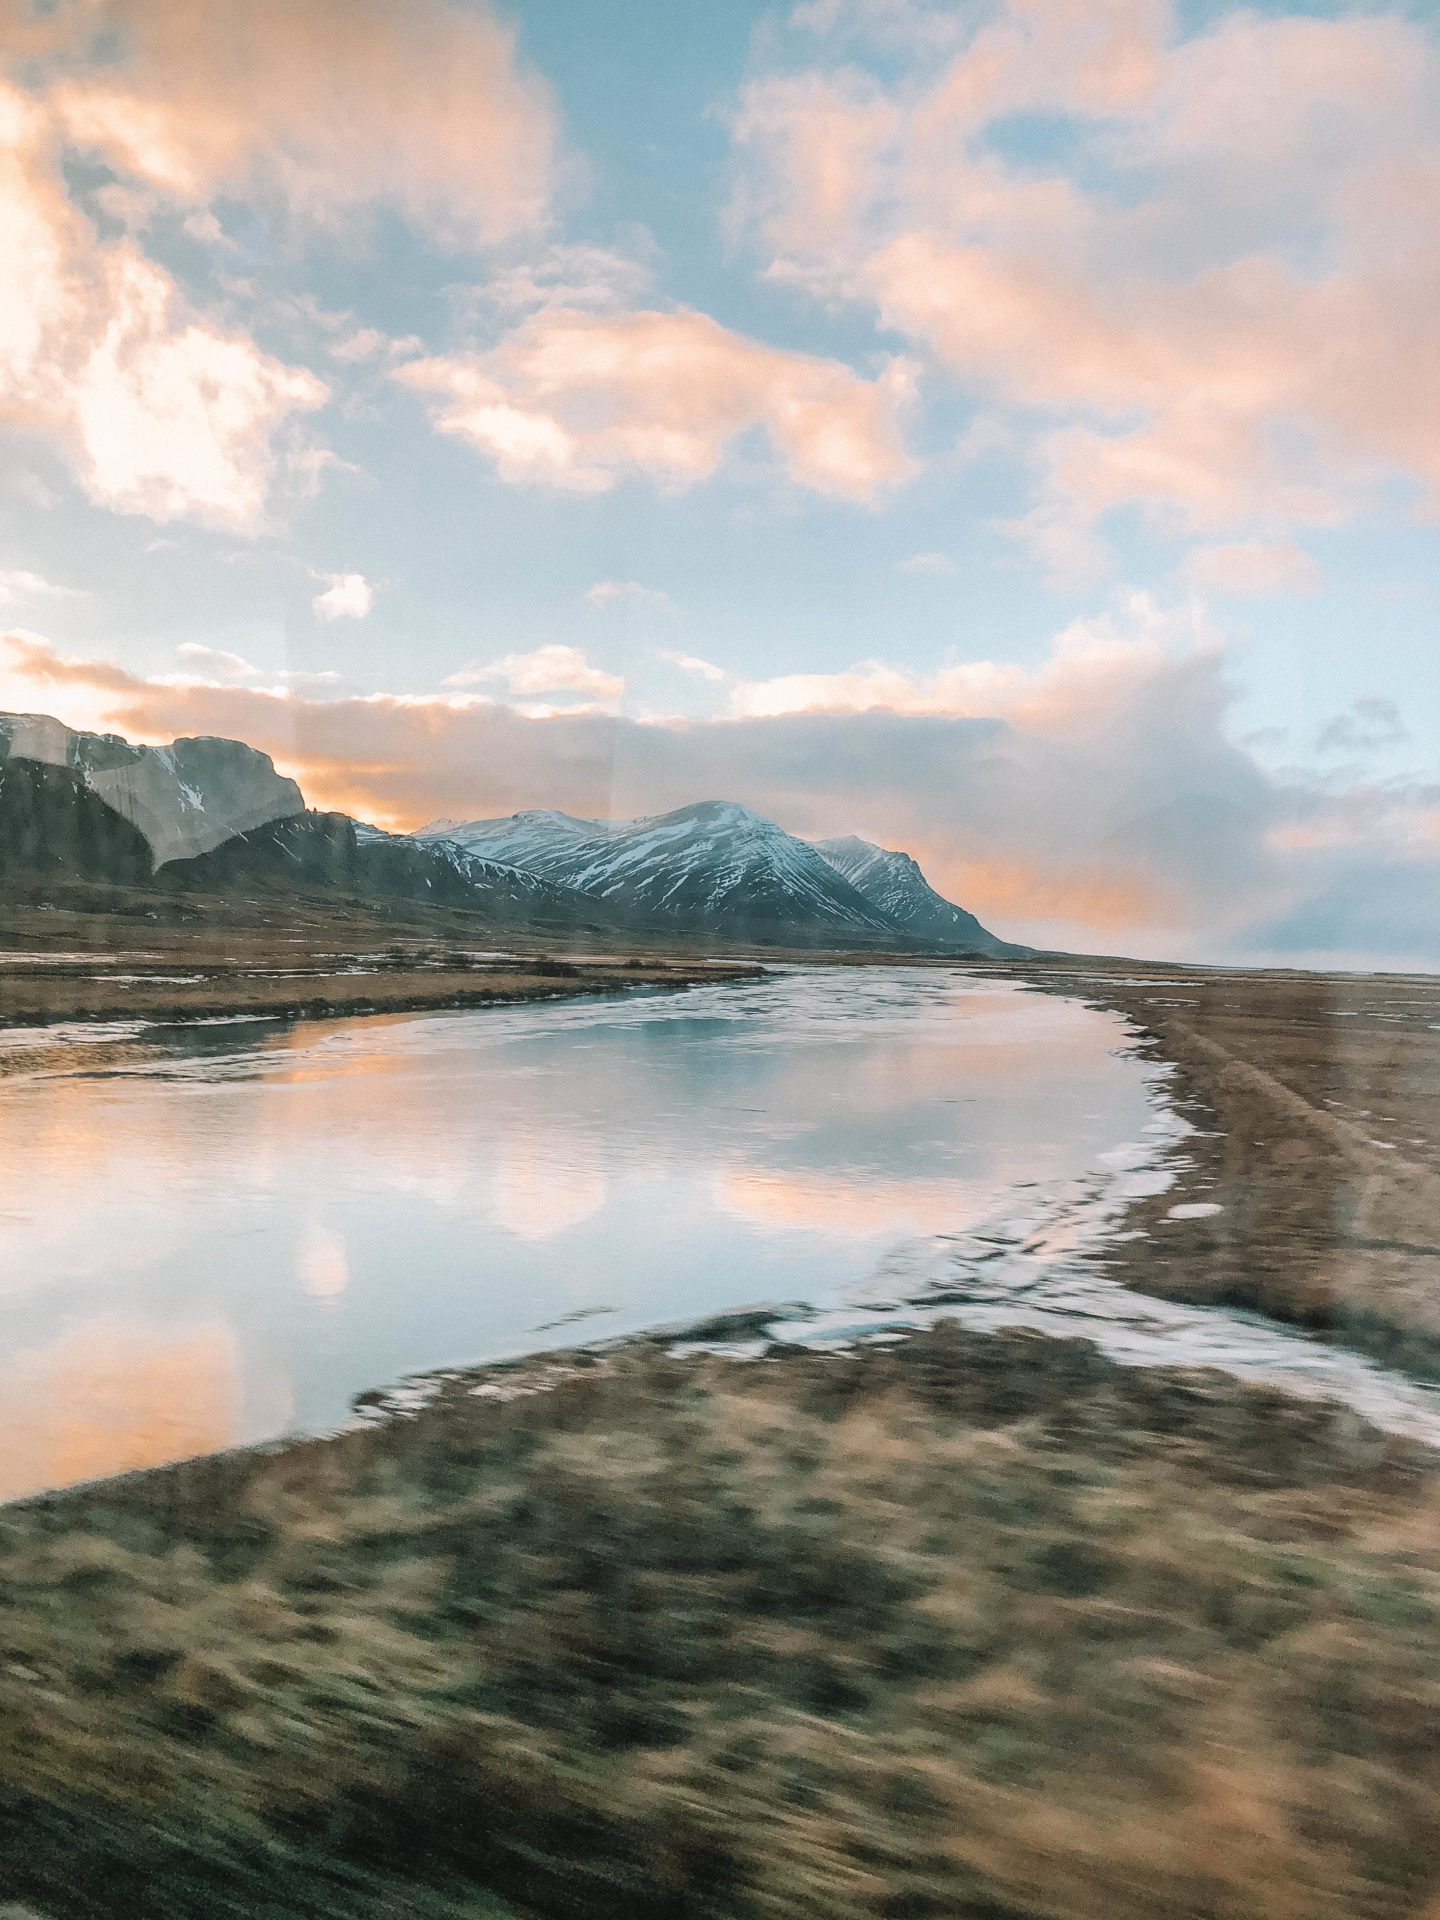 Paysages Islande - Blondie Baby blog mode et voyages